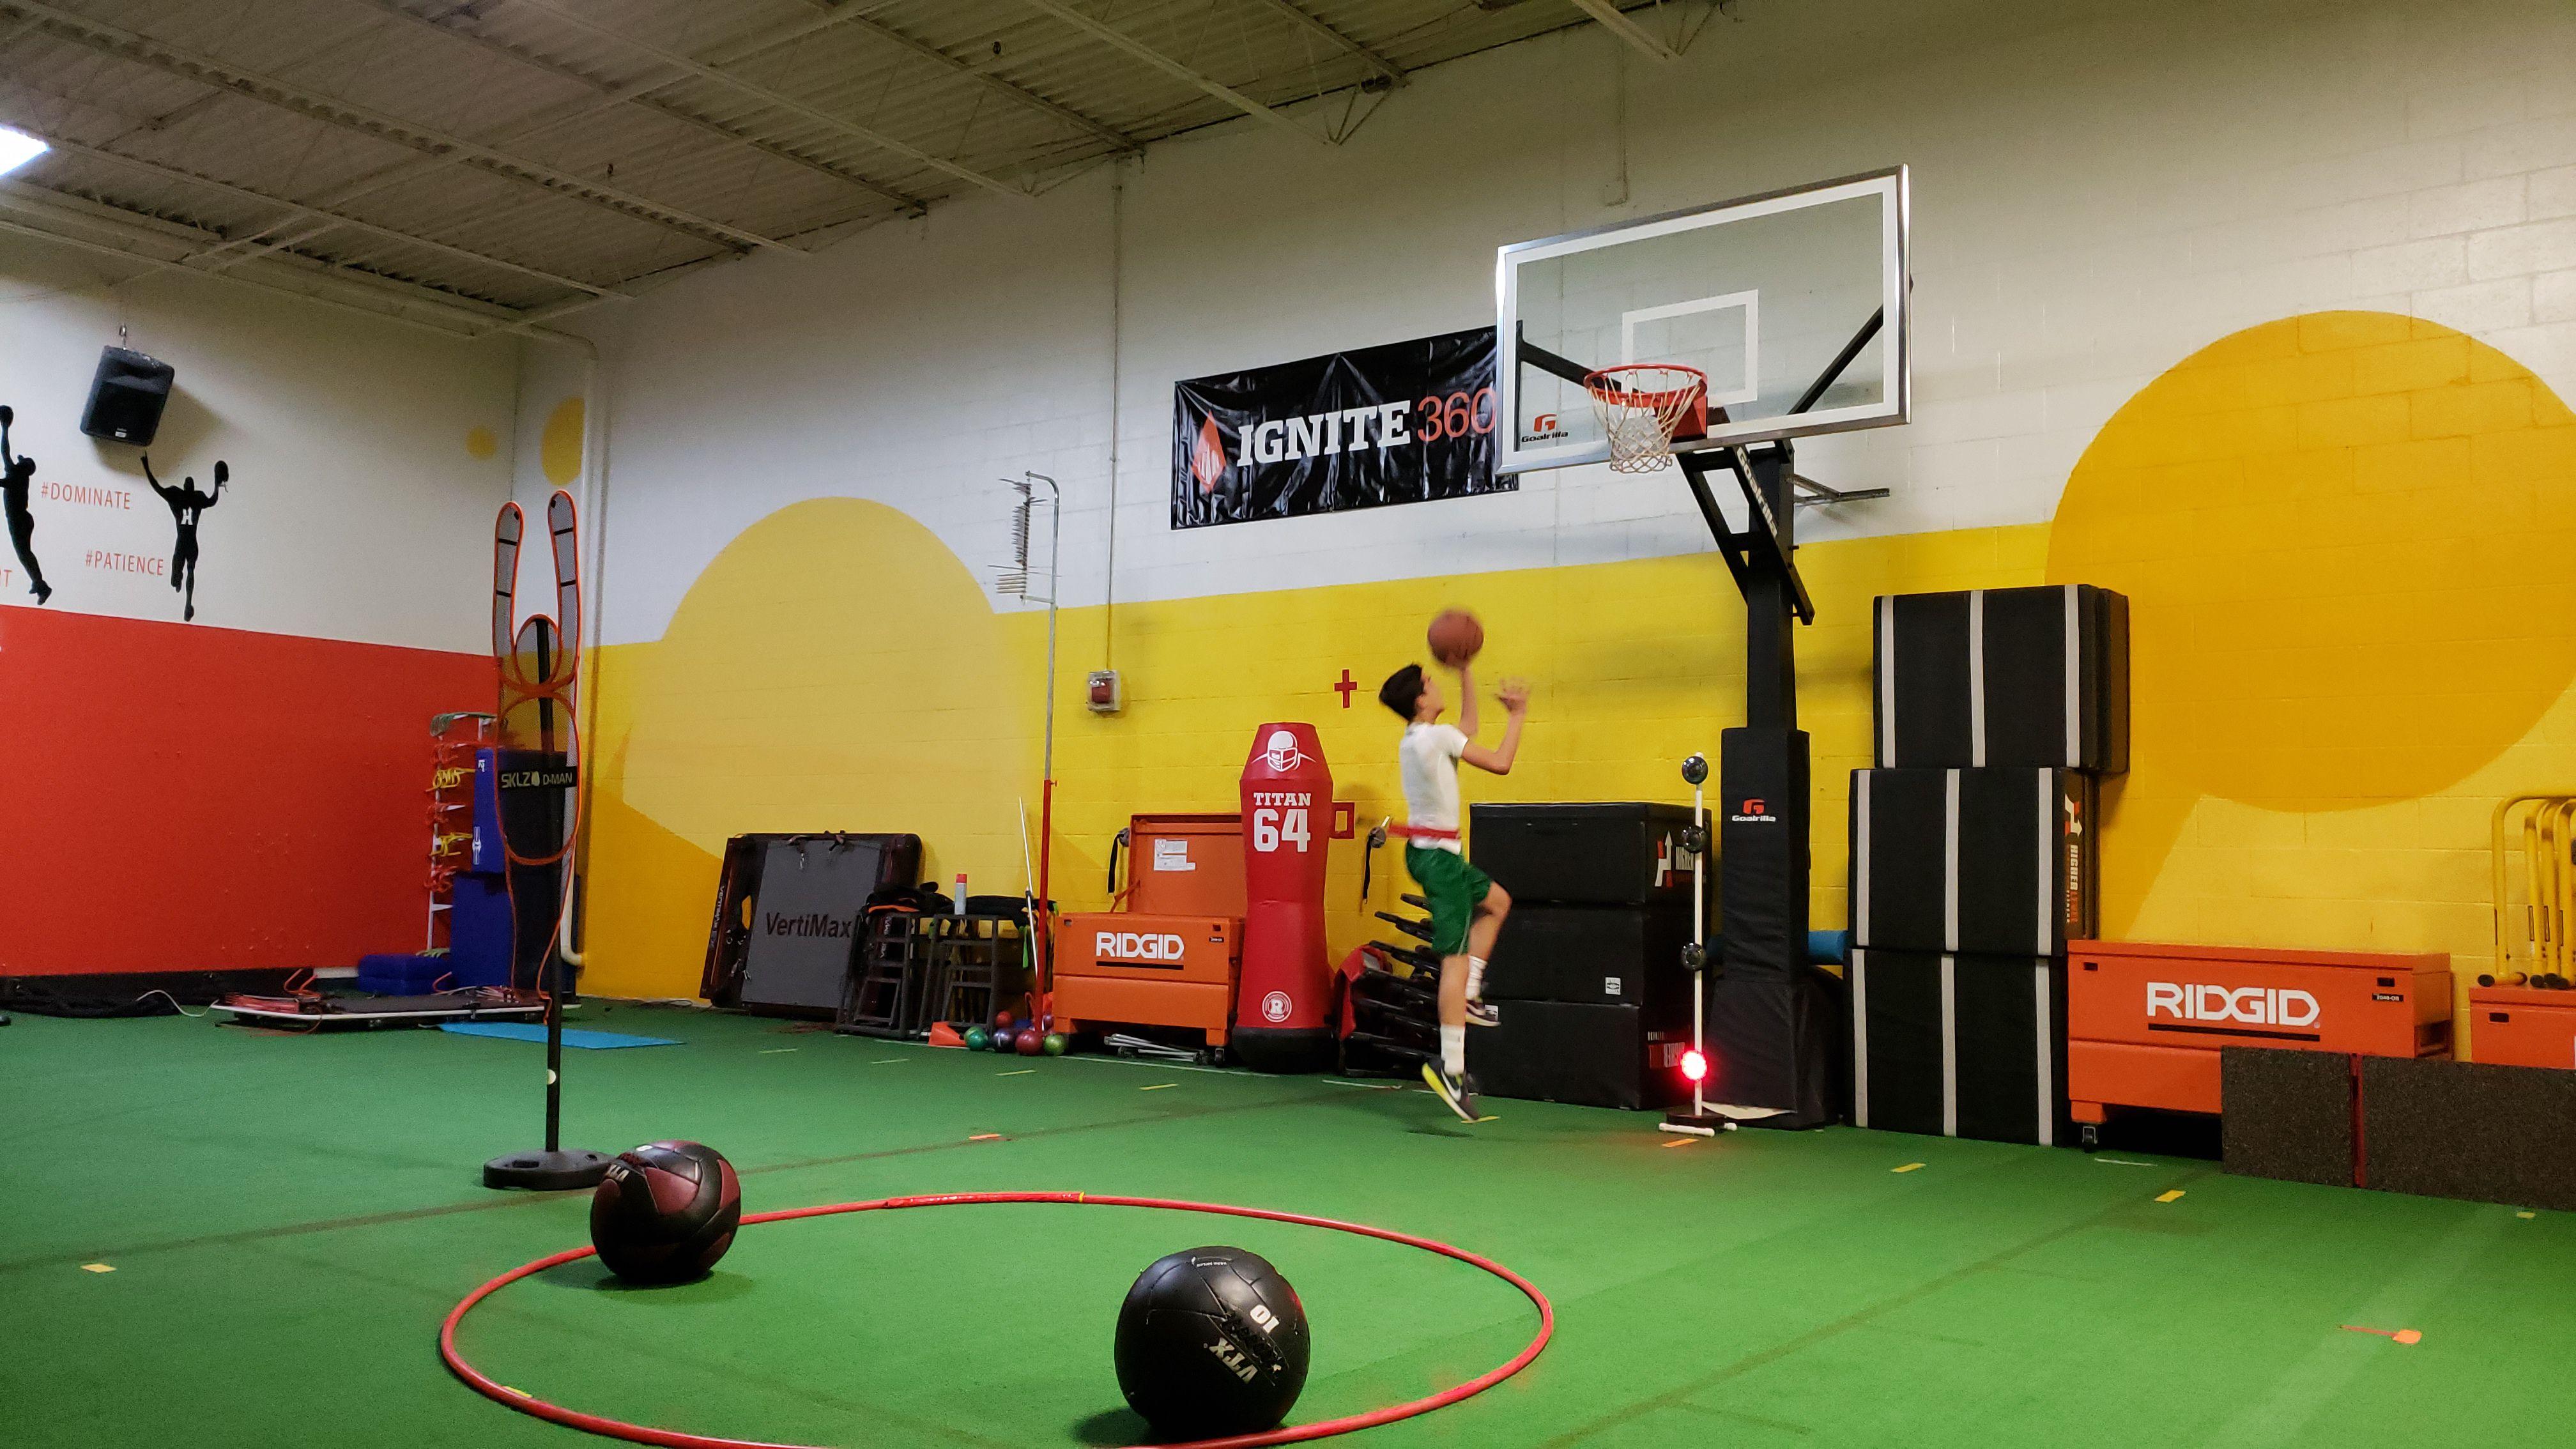 Vertimax Raptor - Higher Level Athletic Fitness